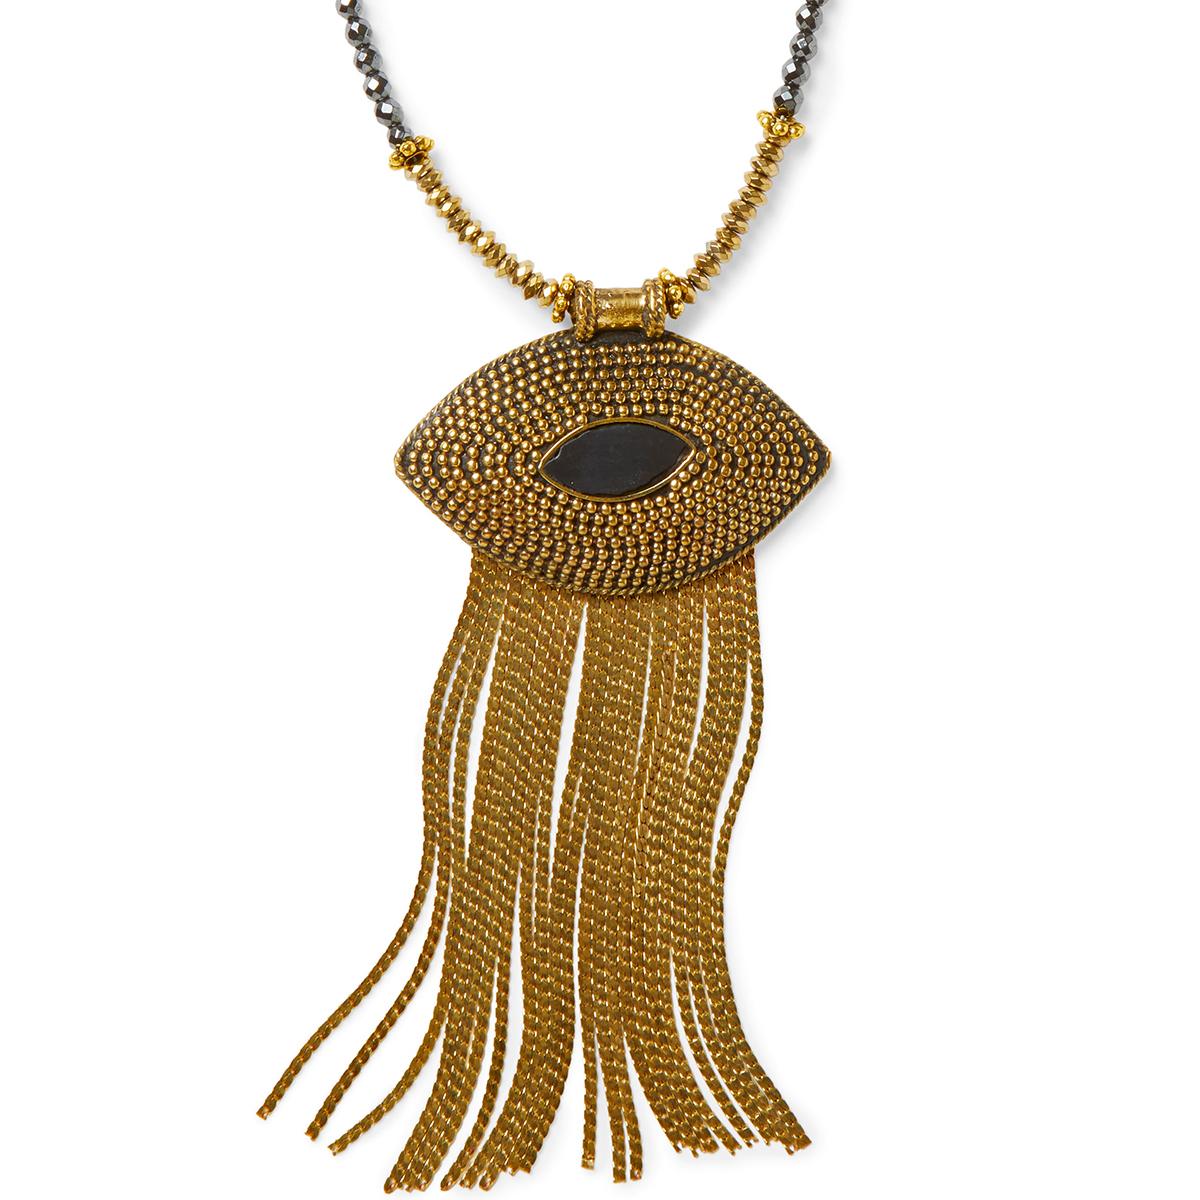 marquis pendant necklace